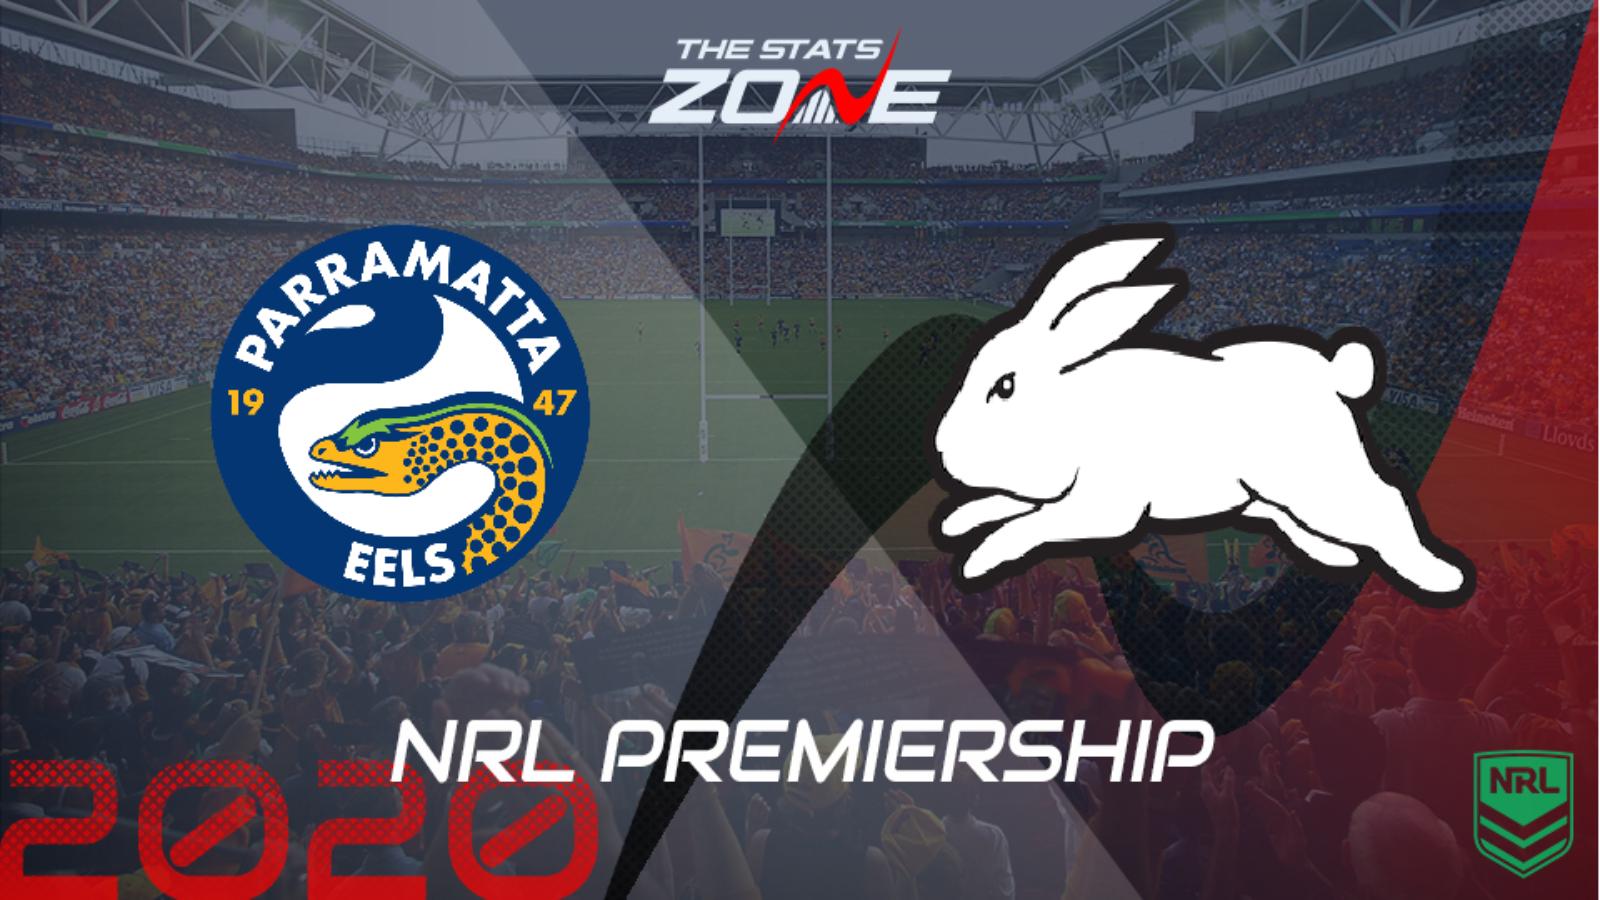 2020 Nrl Parramatta Eels Vs South Sydney Rabbitohs Preview Prediction The Stats Zone